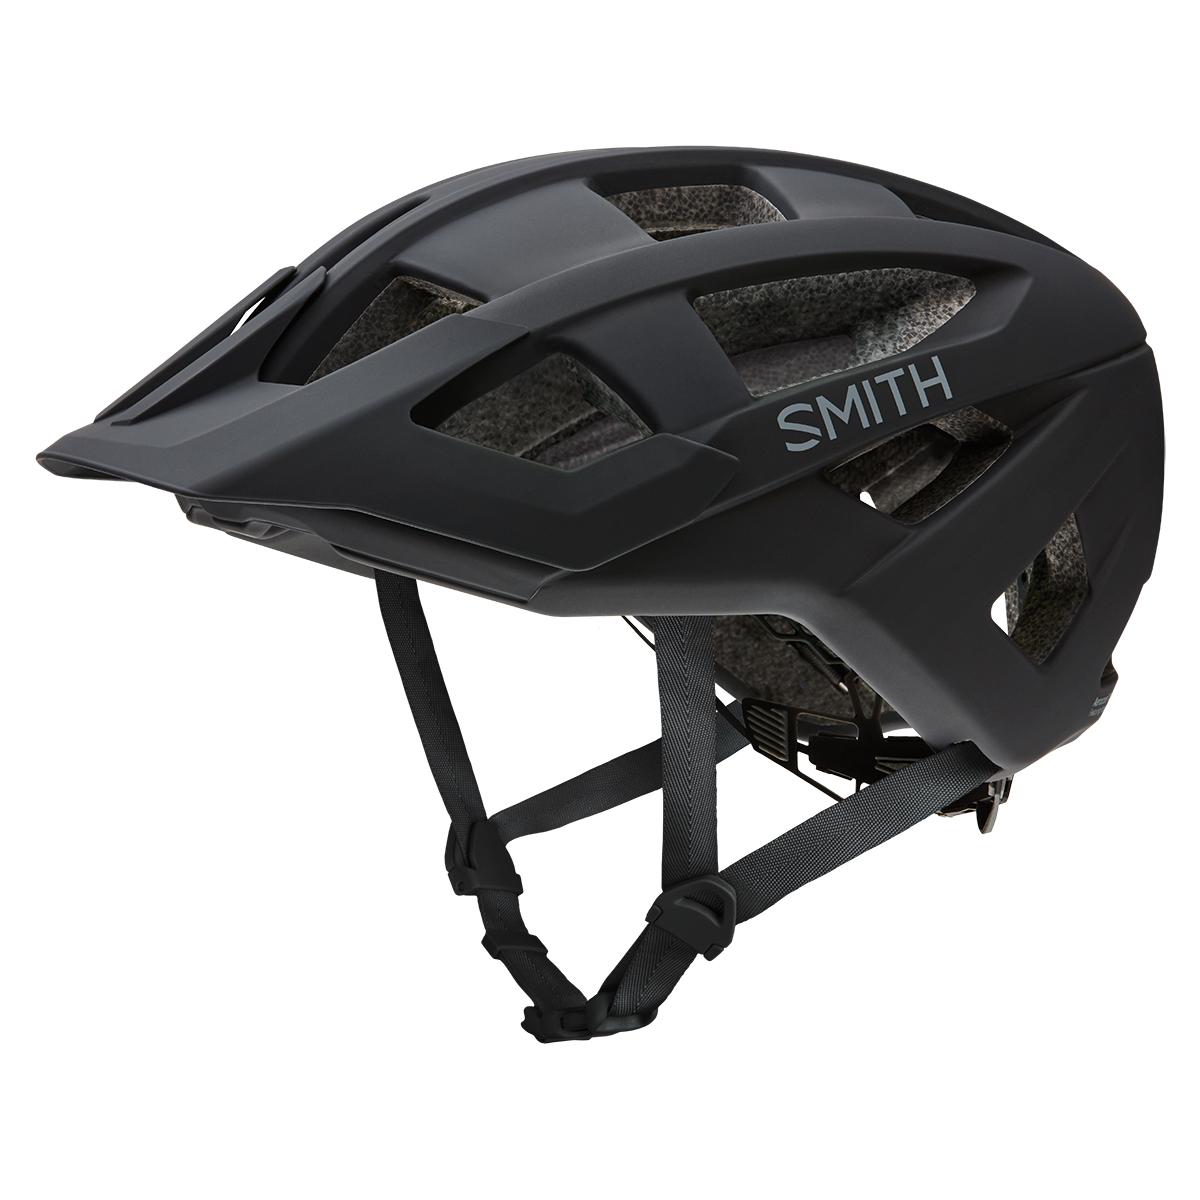 SMITH Venture(スミス Venture(スミス ベンチャー ) ) ヘルメット ヘルメット 2018, 長南町:23f4bdc9 --- jphupkens.be